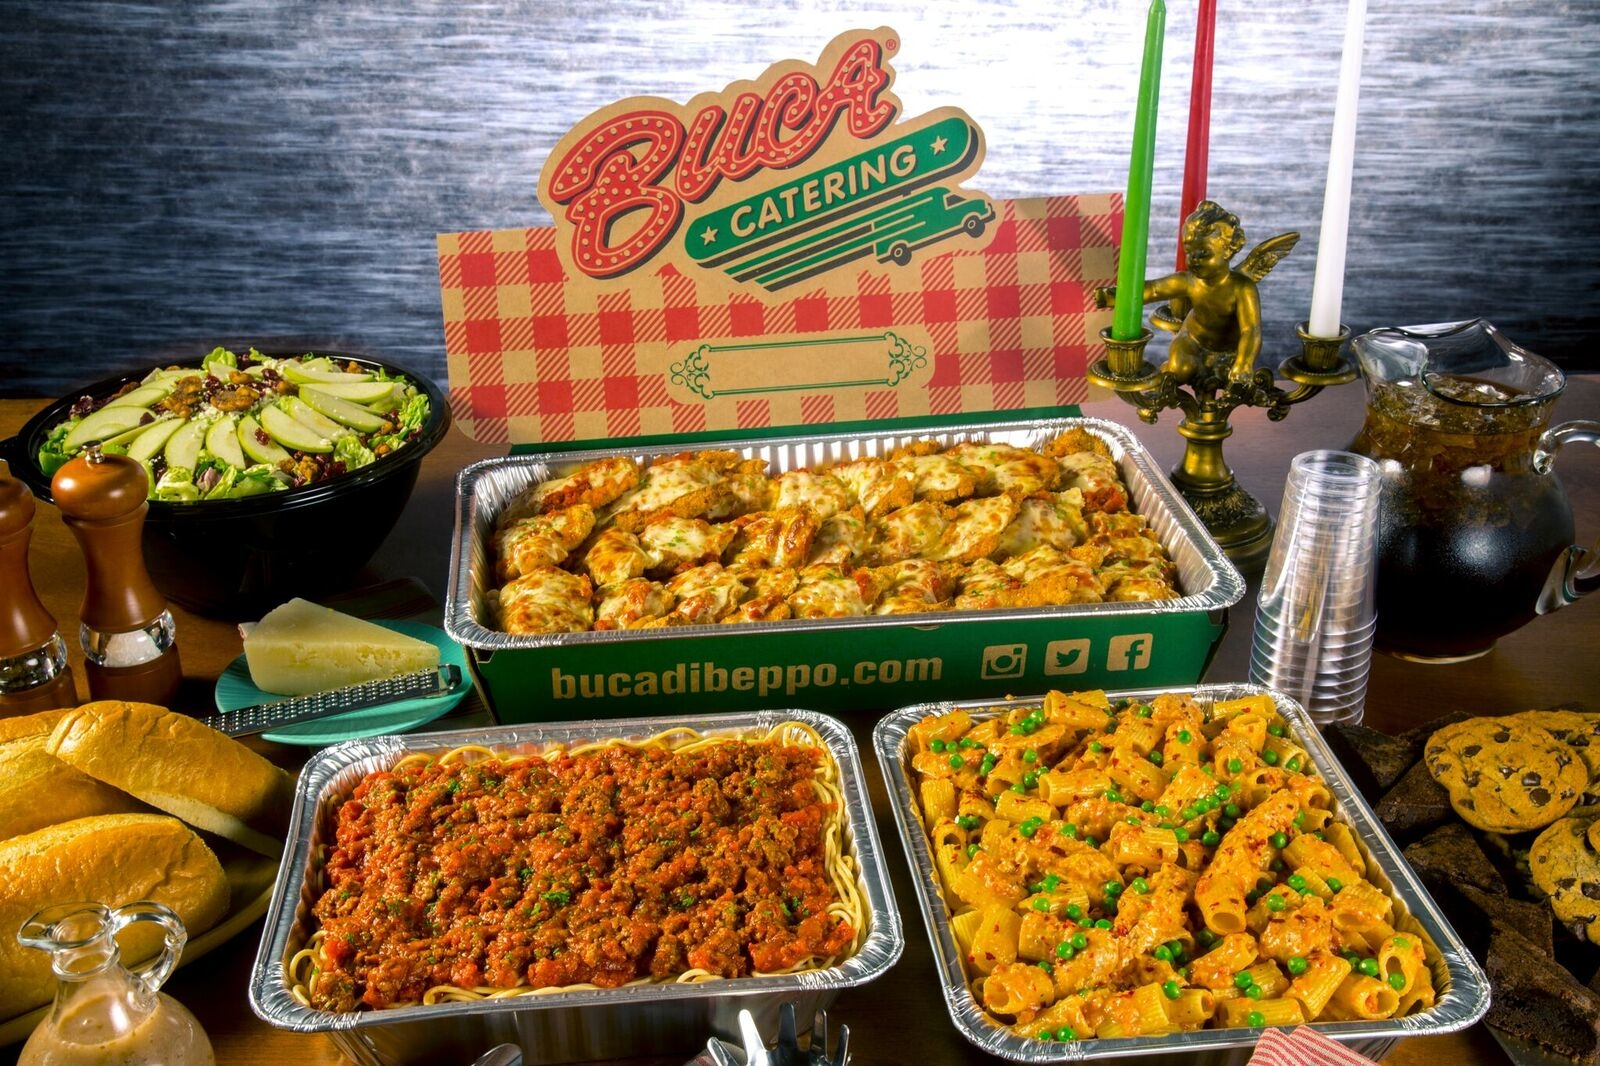 Buca di Beppo Italian Restaurant image 4